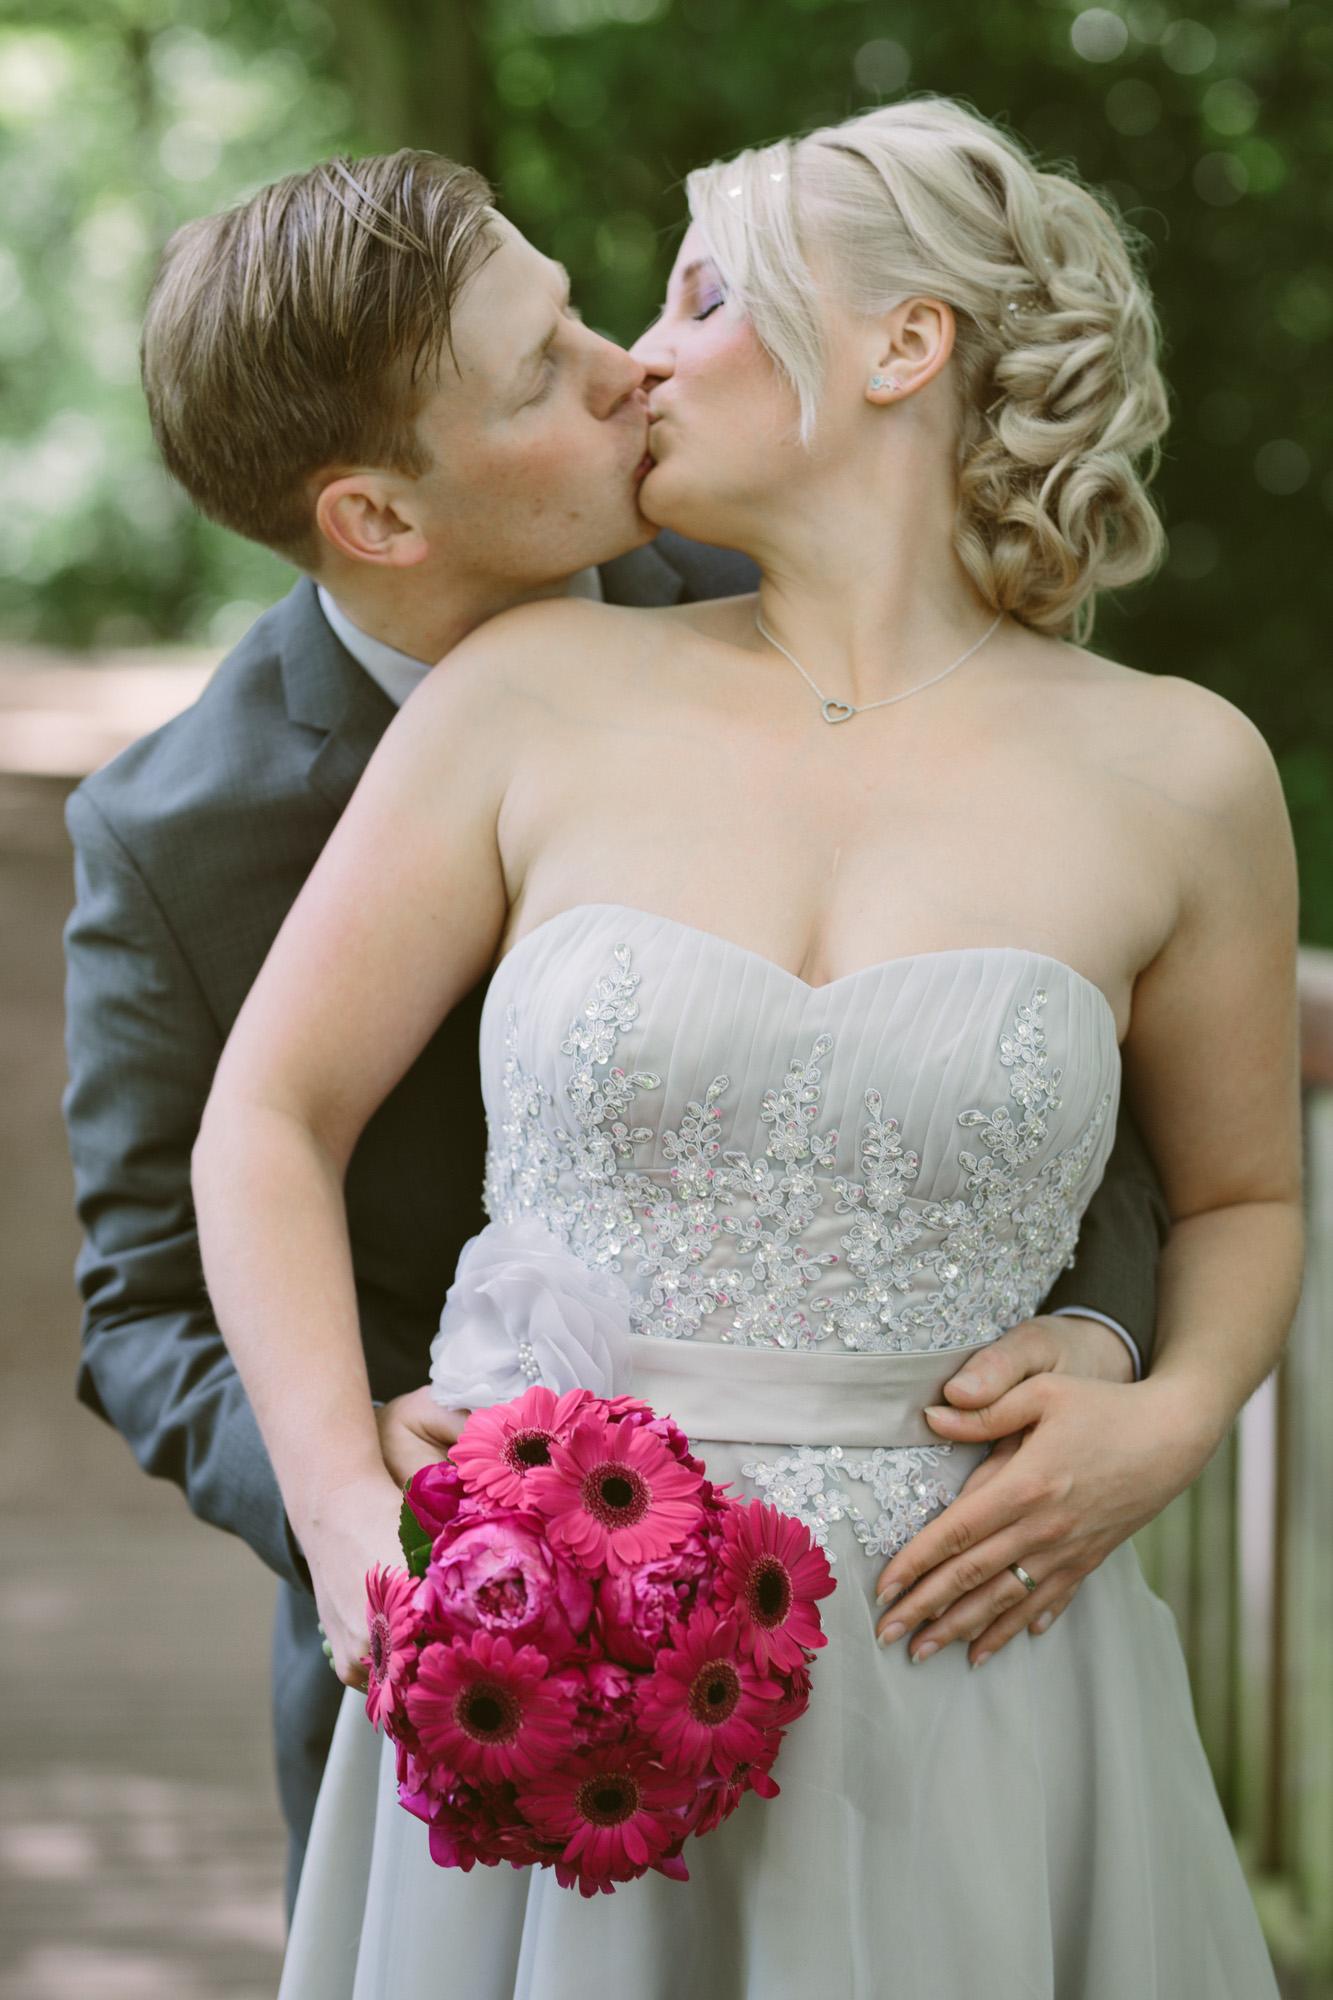 Claudia-Krawinkel-Hochzeitsfotografie-Essen-Duisburg-Standesamt-Schloss-Borbeck-21